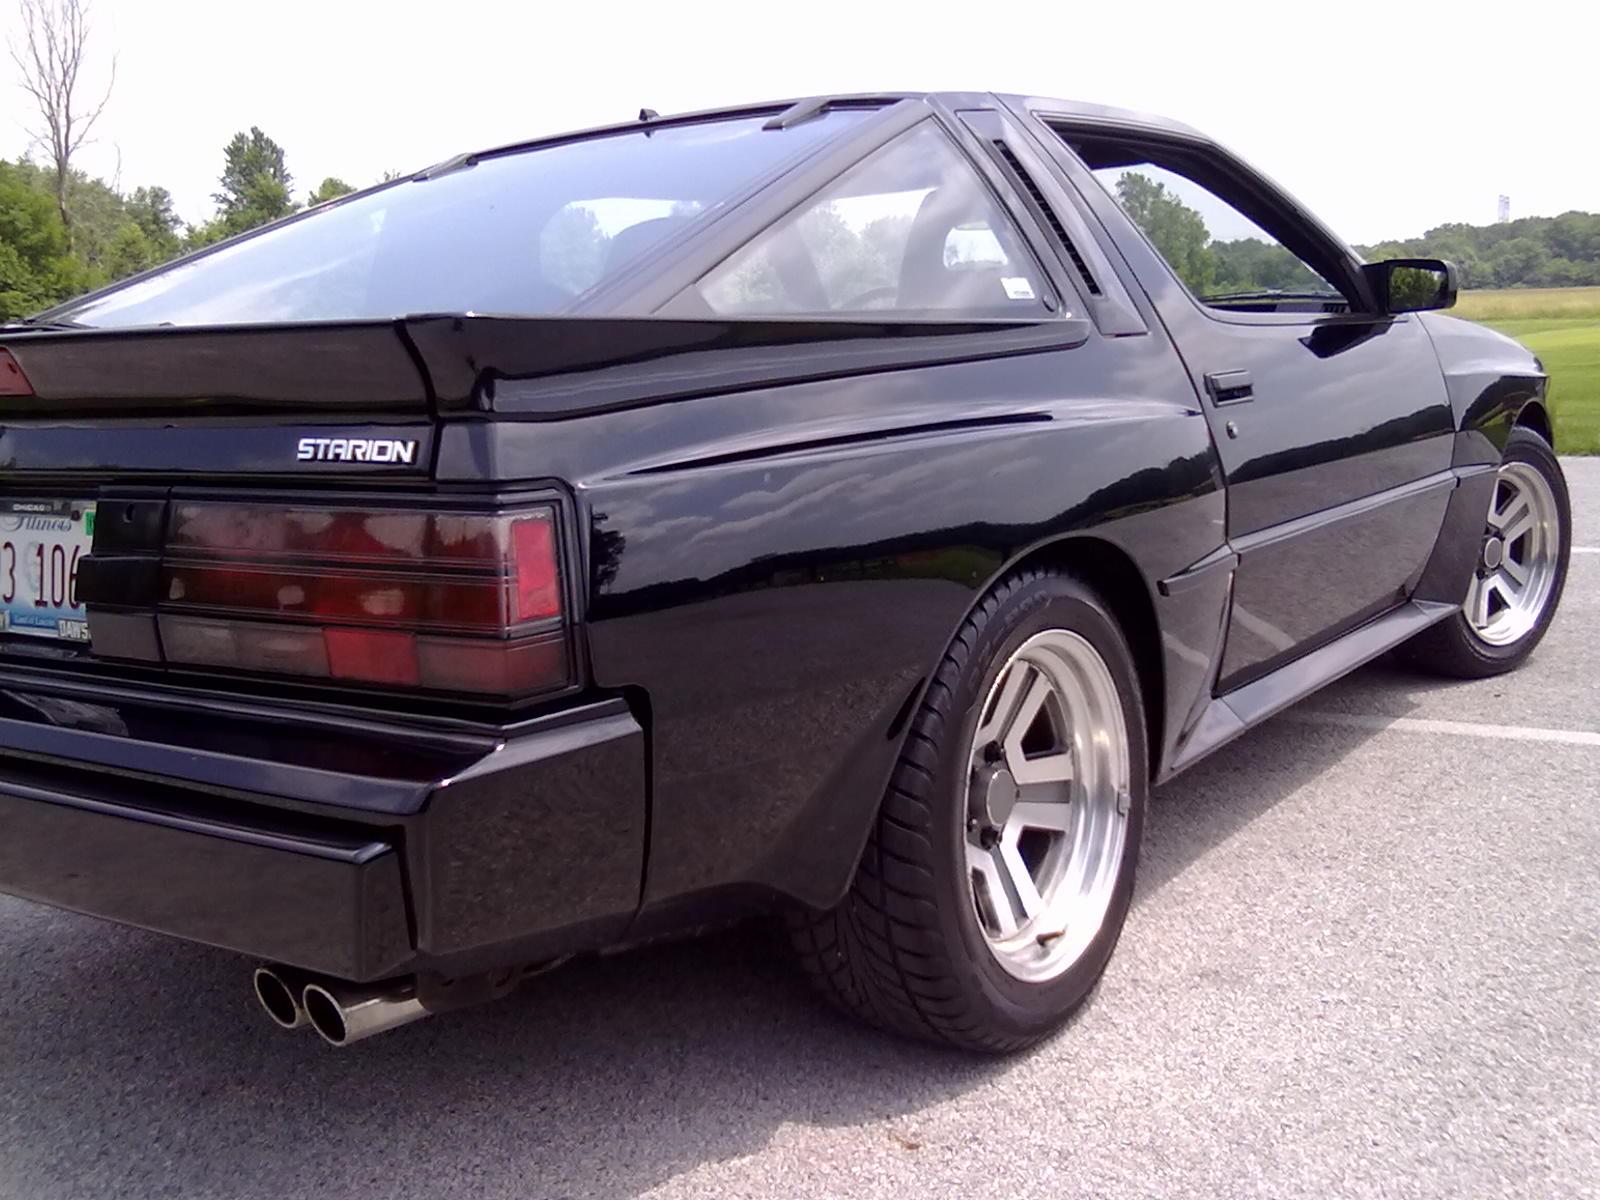 Mitsubishi Starion 1982 - 1989 Coupe #7